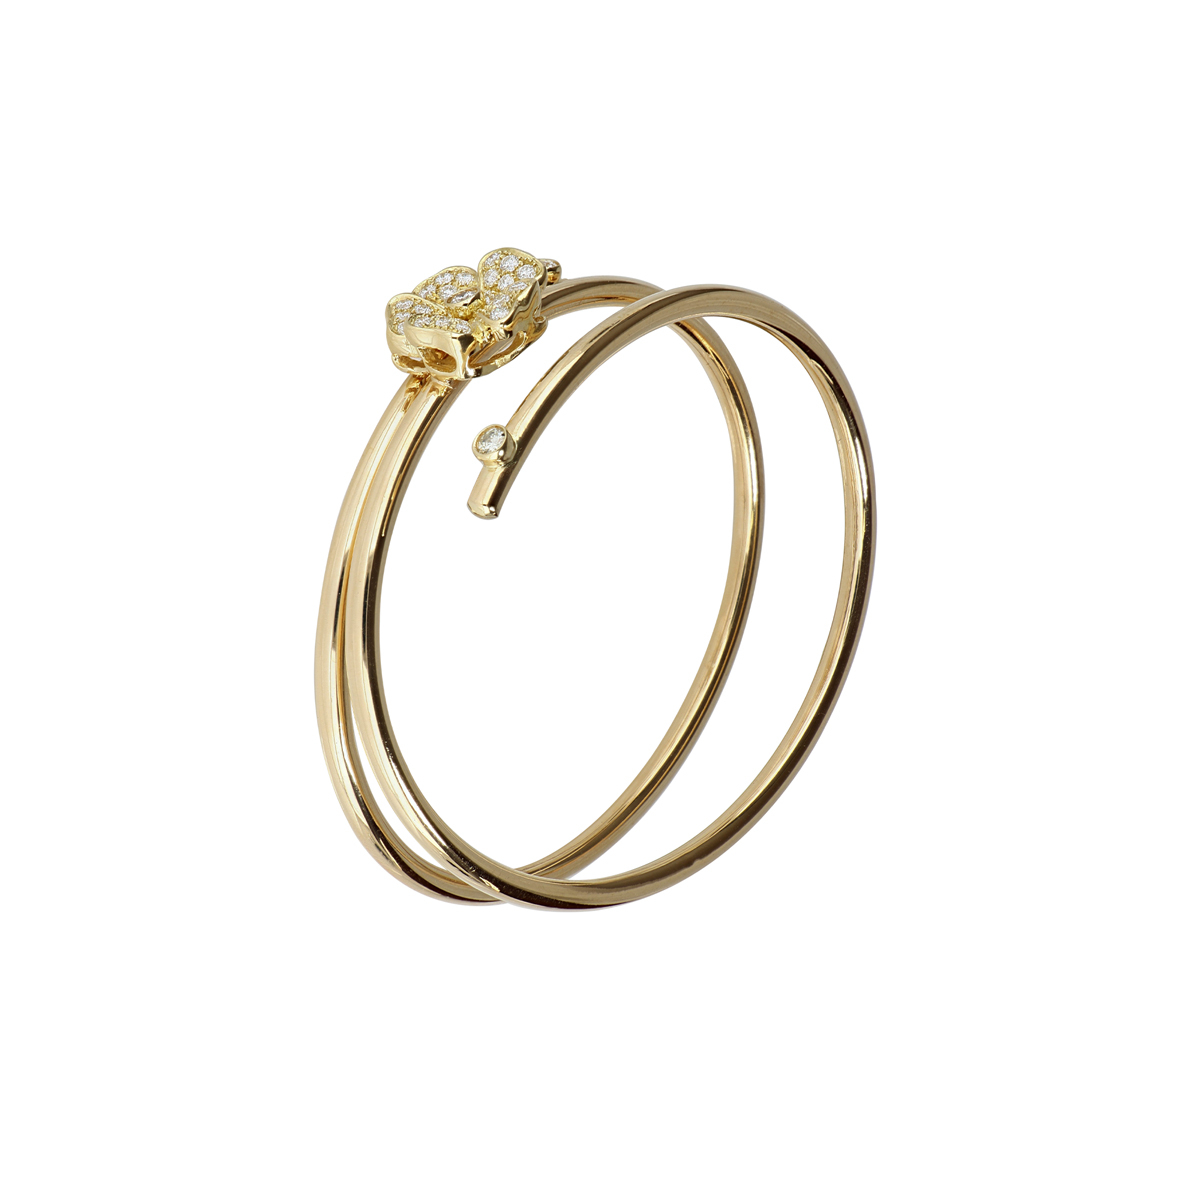 Yellow Gold Spiral Bracelet with Diamond Flower